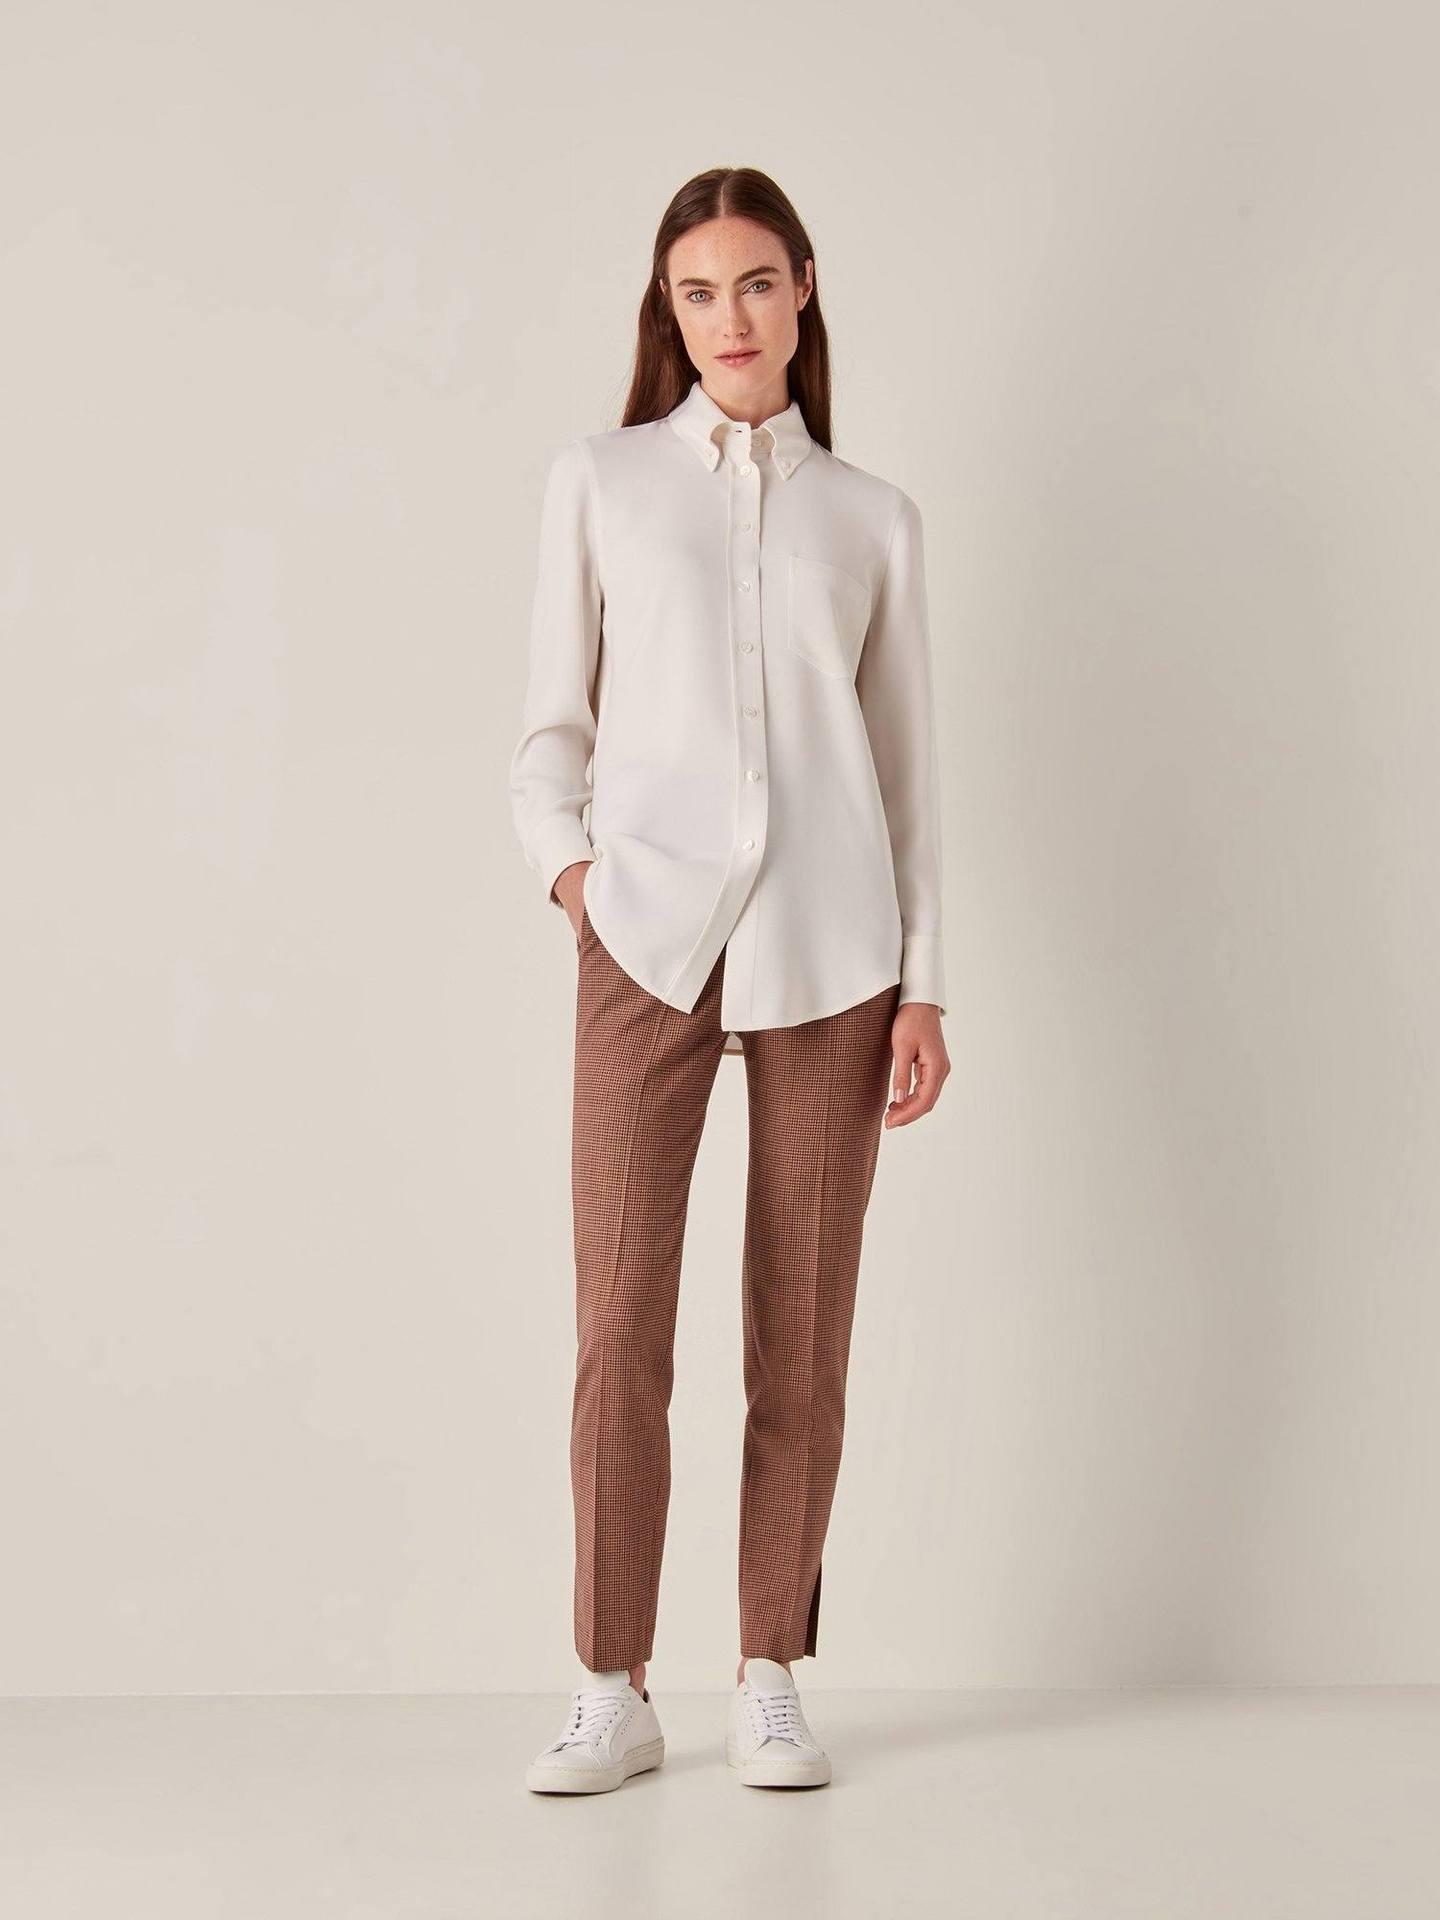 tate-blouse-offwhite-takashi-pant-brickred-hero-2018_06_28_J_C20092_1440x.jpg